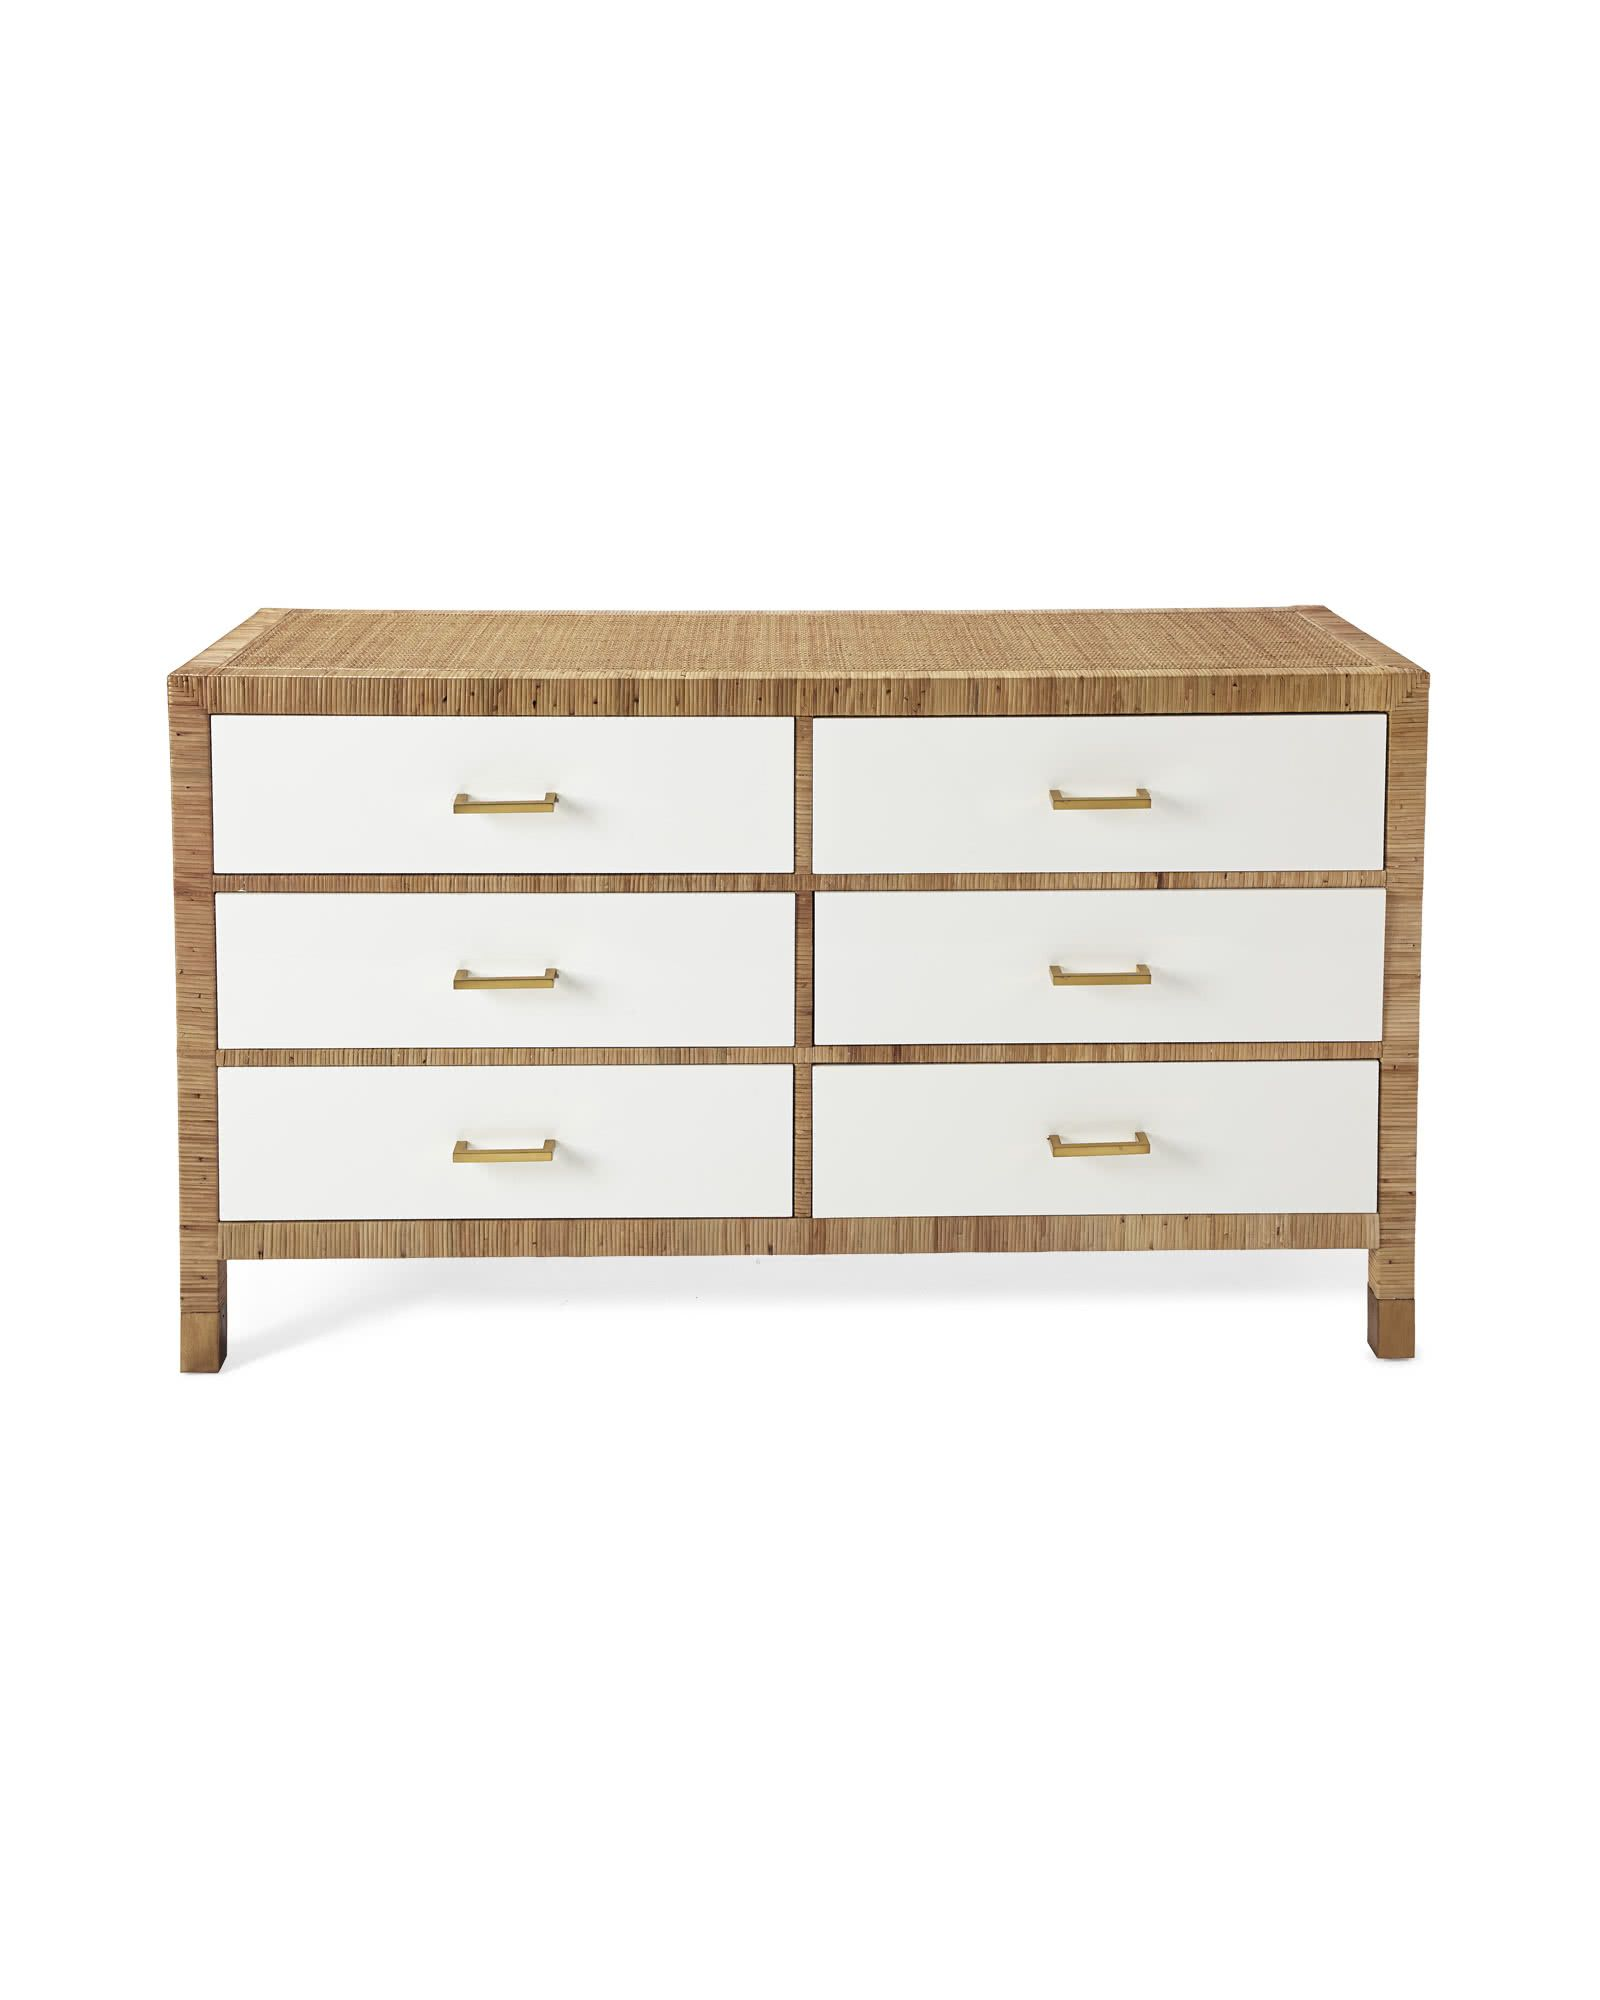 Balboa Dresser Dresser Design Wide Dresser Repurposed Furniture [ 2000 x 1600 Pixel ]